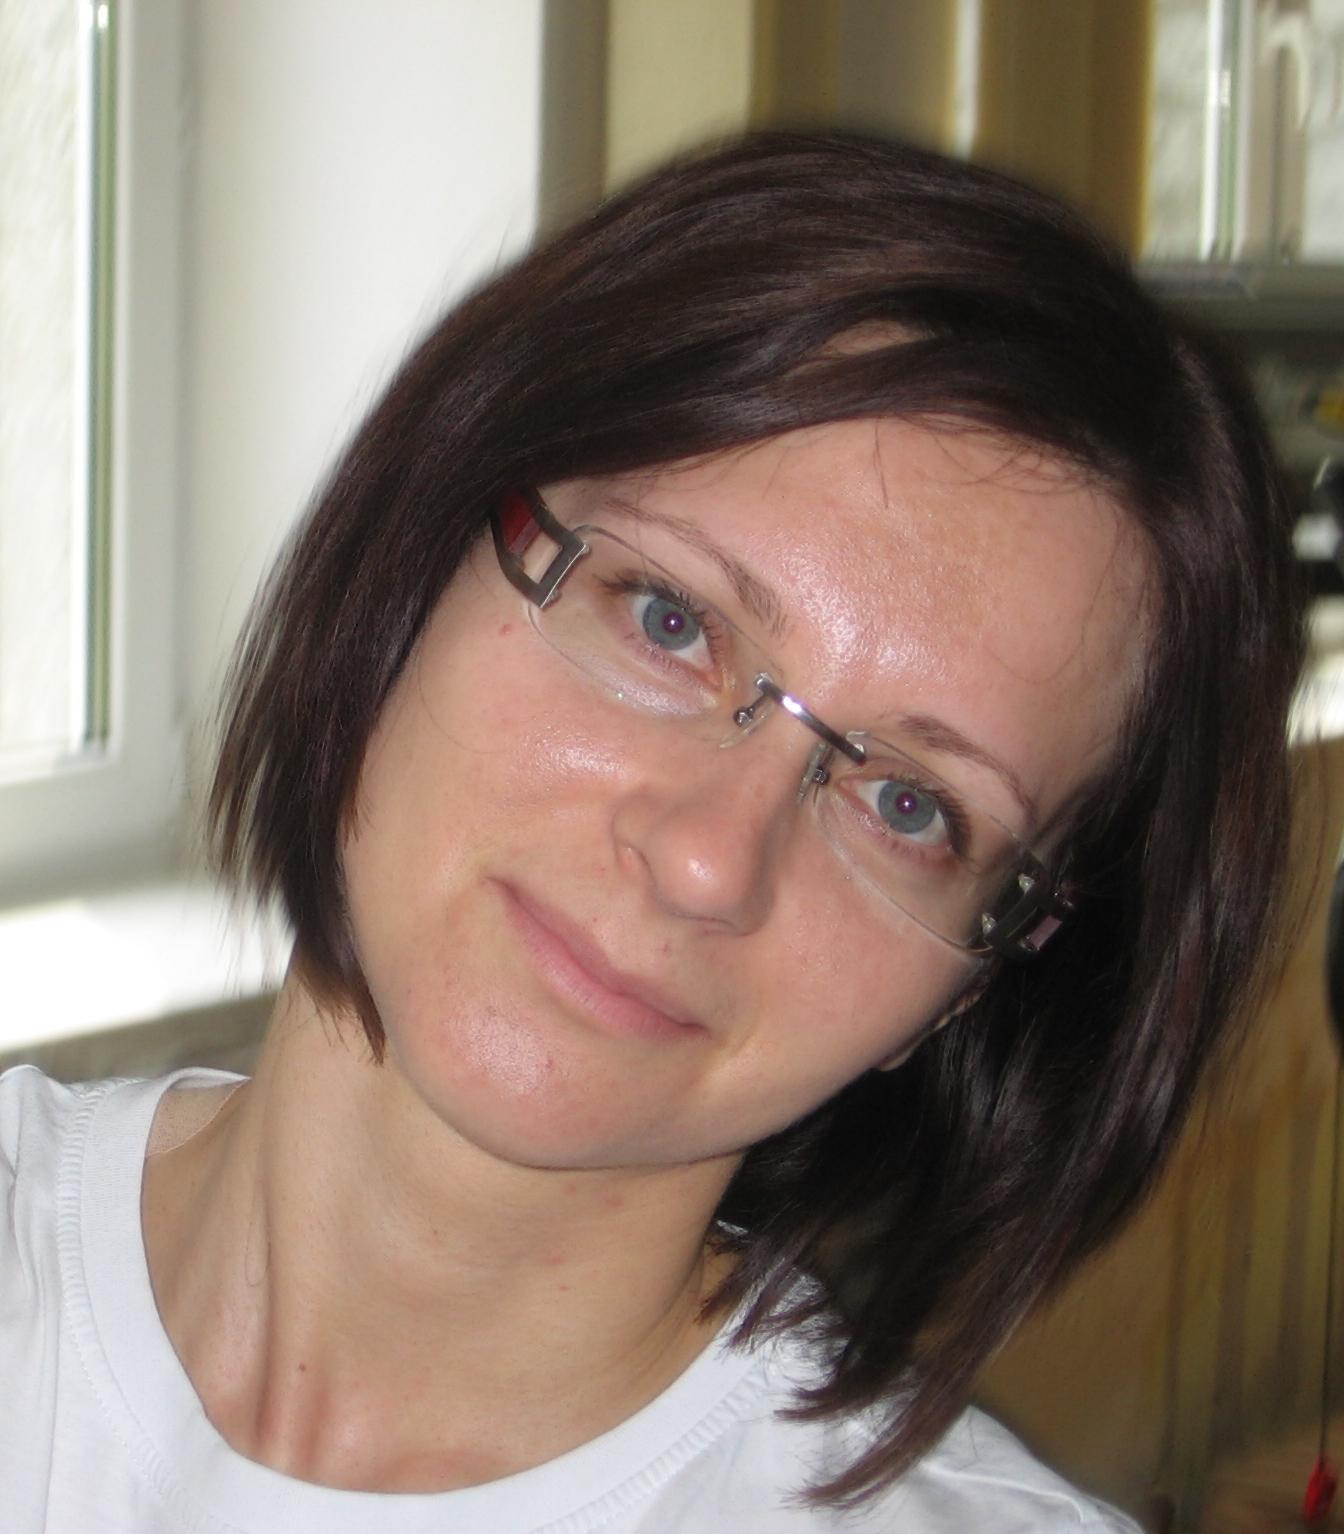 Agnieszka Ozimek - 6a0105361c9644970c0120a5c43a9e970b-pi